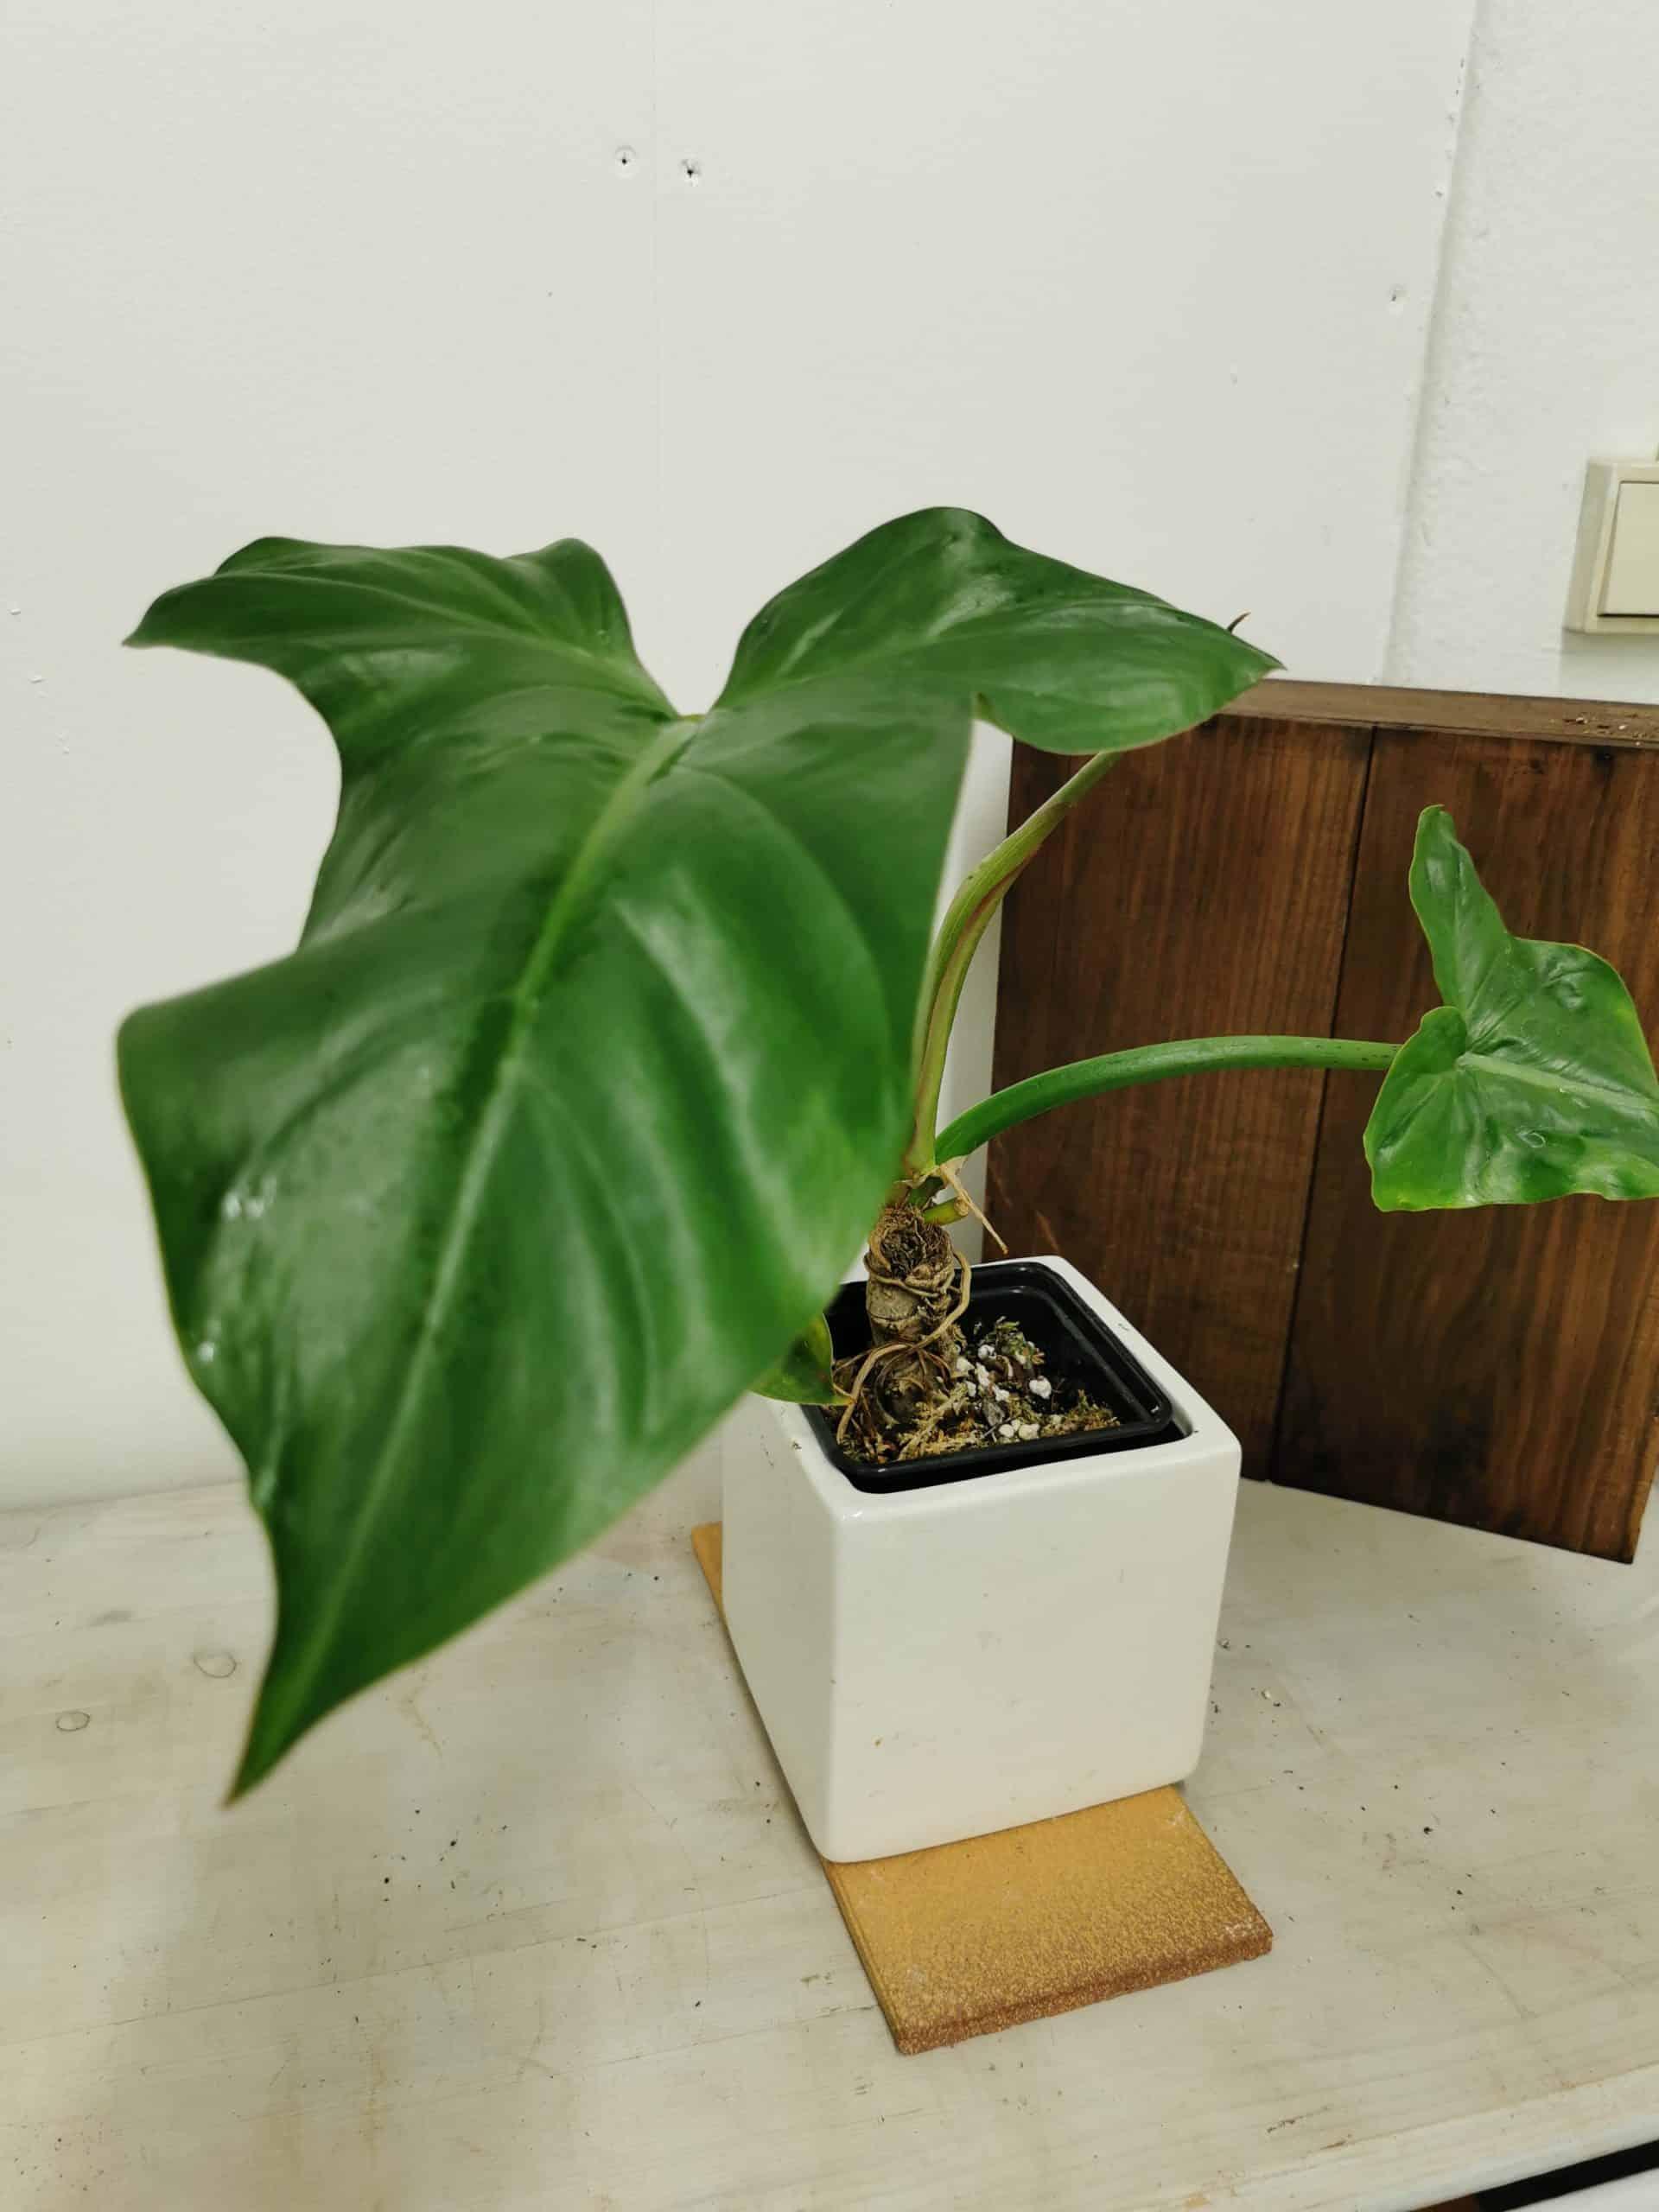 Philodendron sanctamartinense